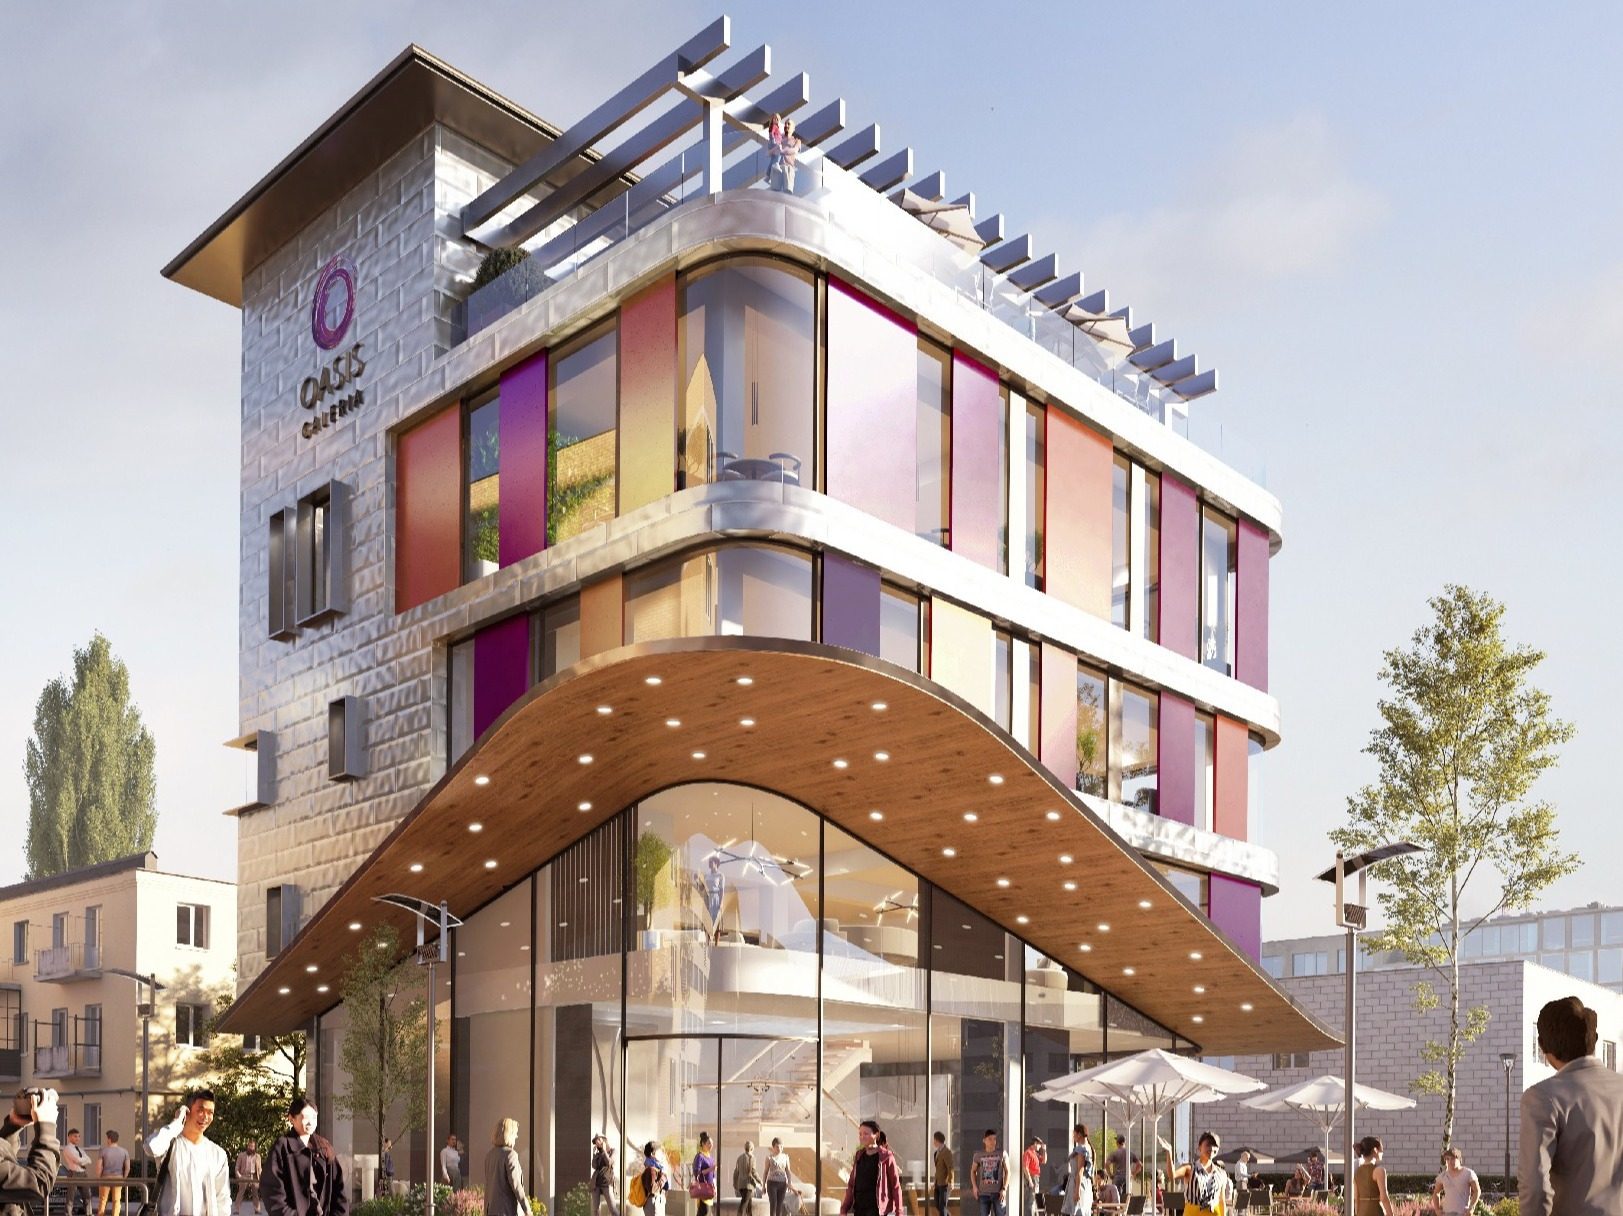 Oasis Galleria Development Project